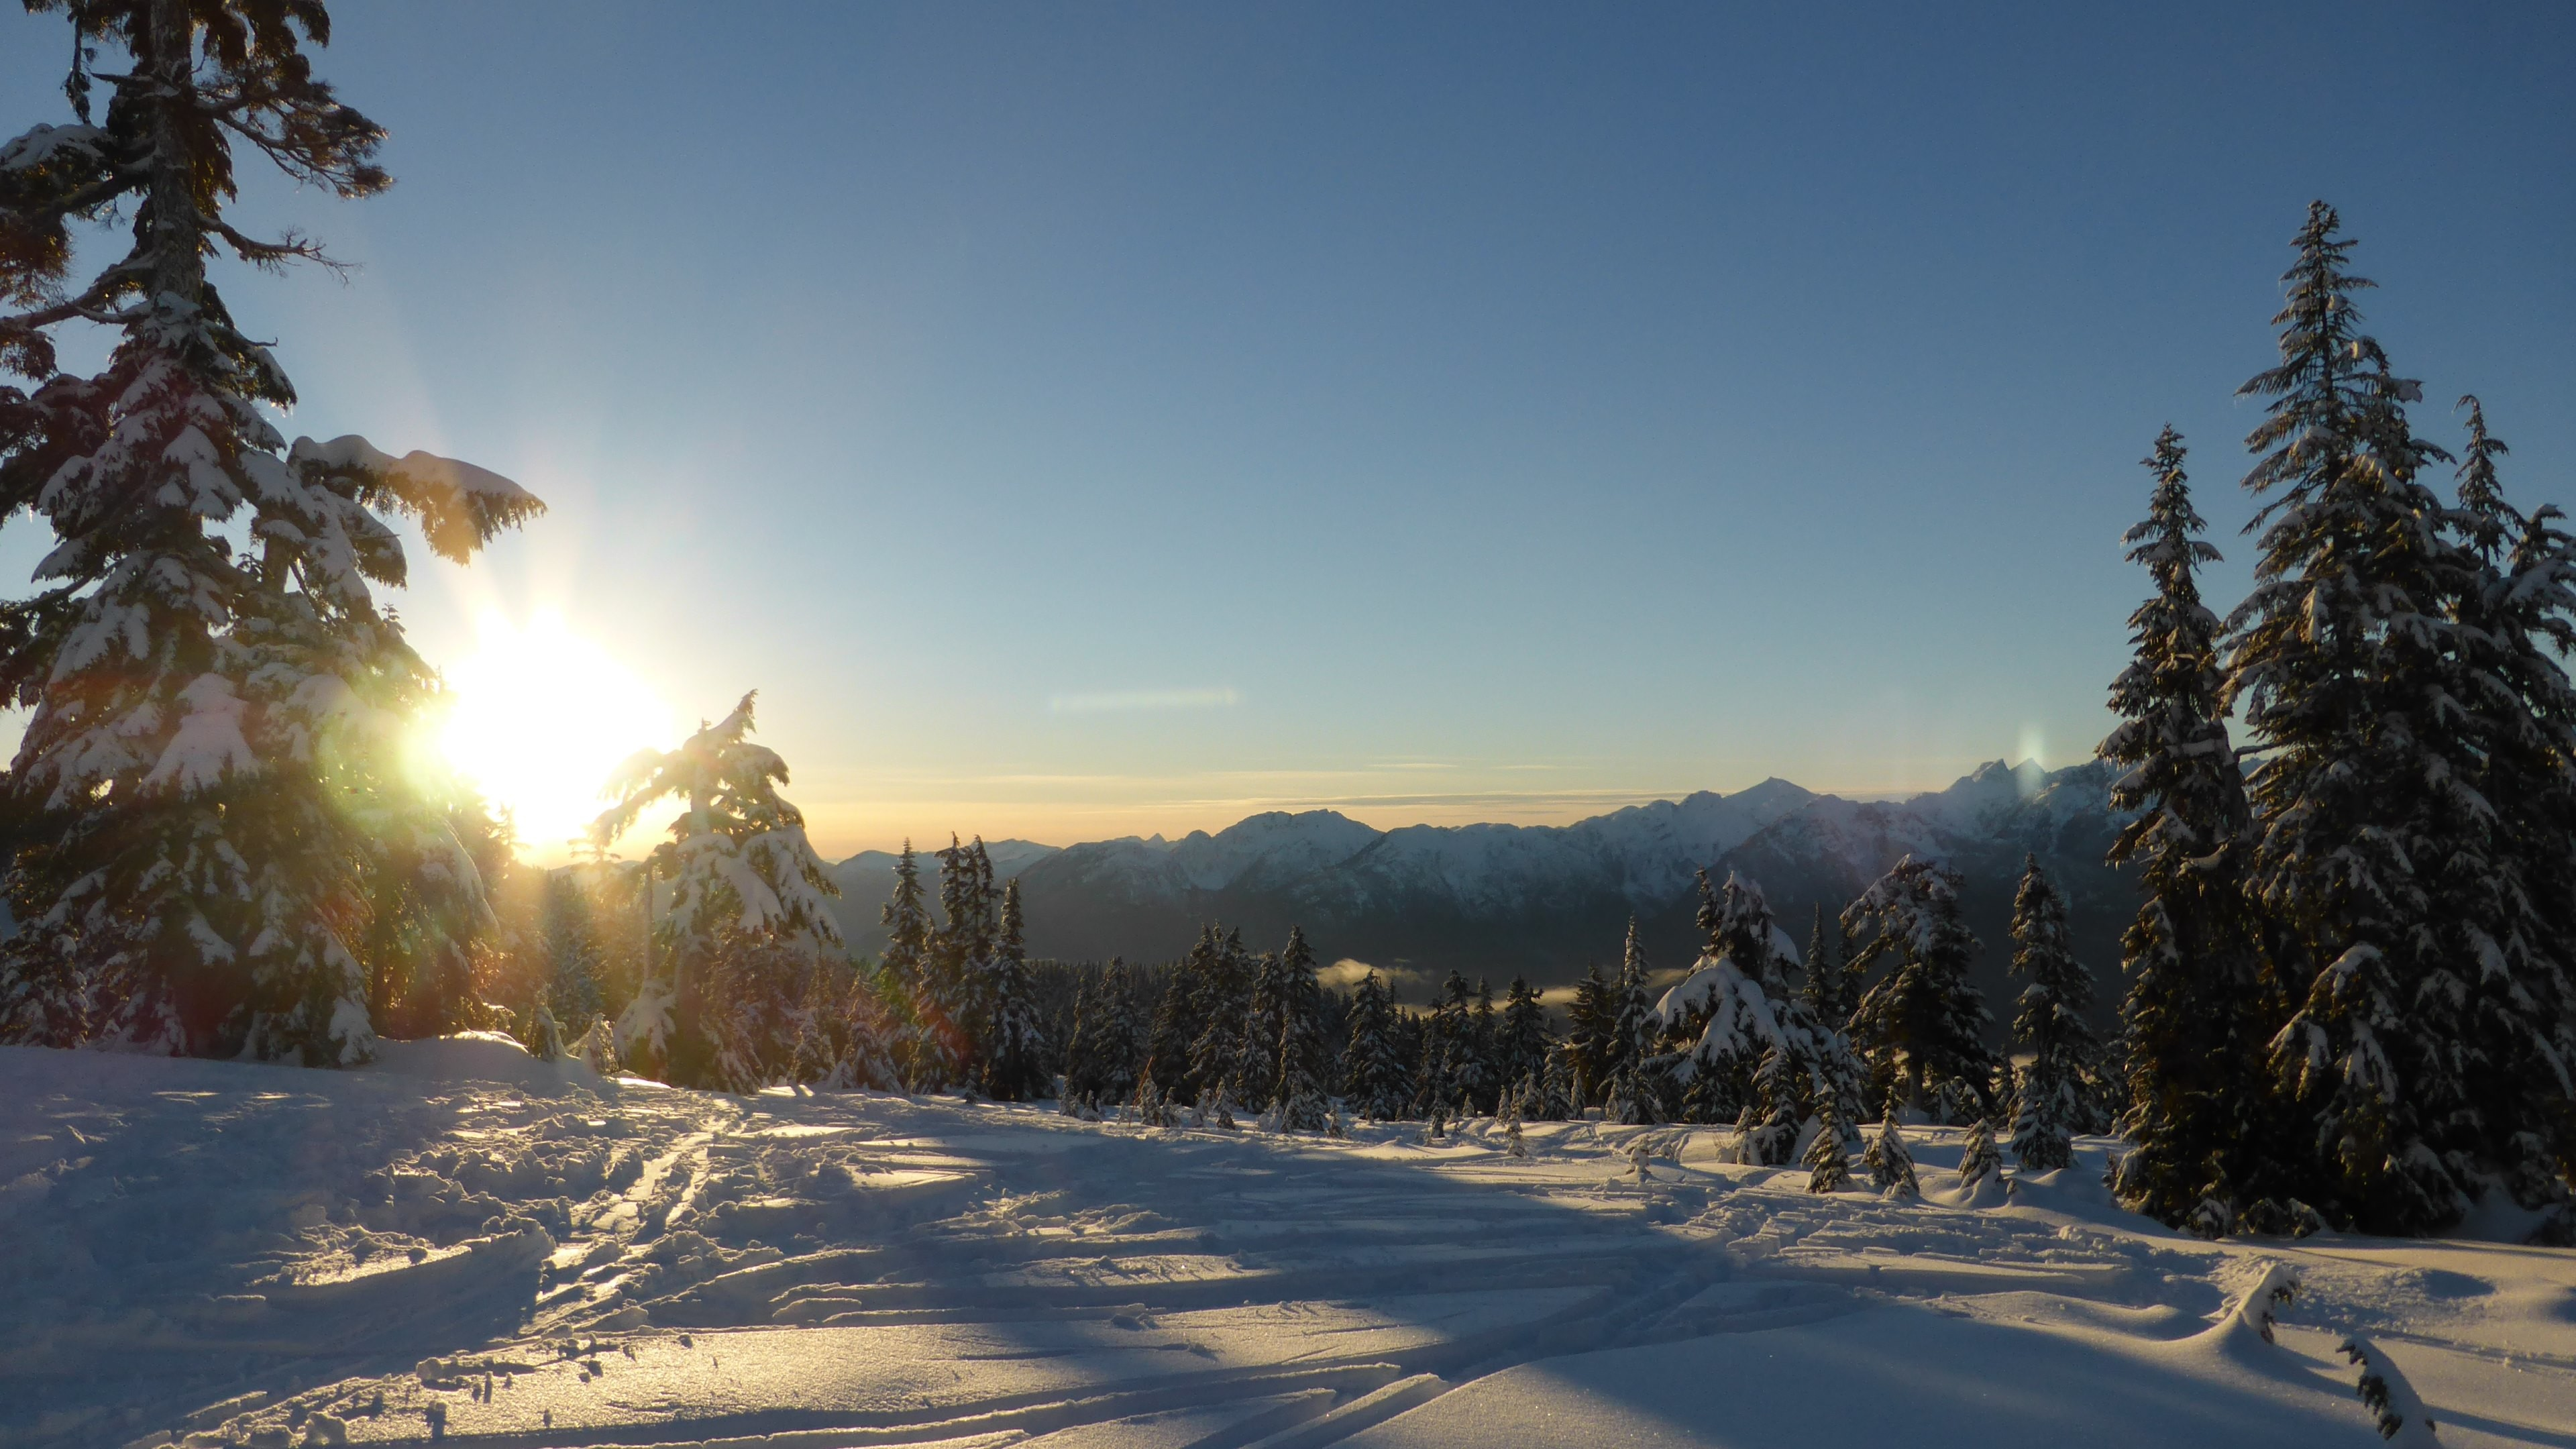 Wallpaper: Snow Mountains Trees Sunset. Ultra HD 4K 3840×2160